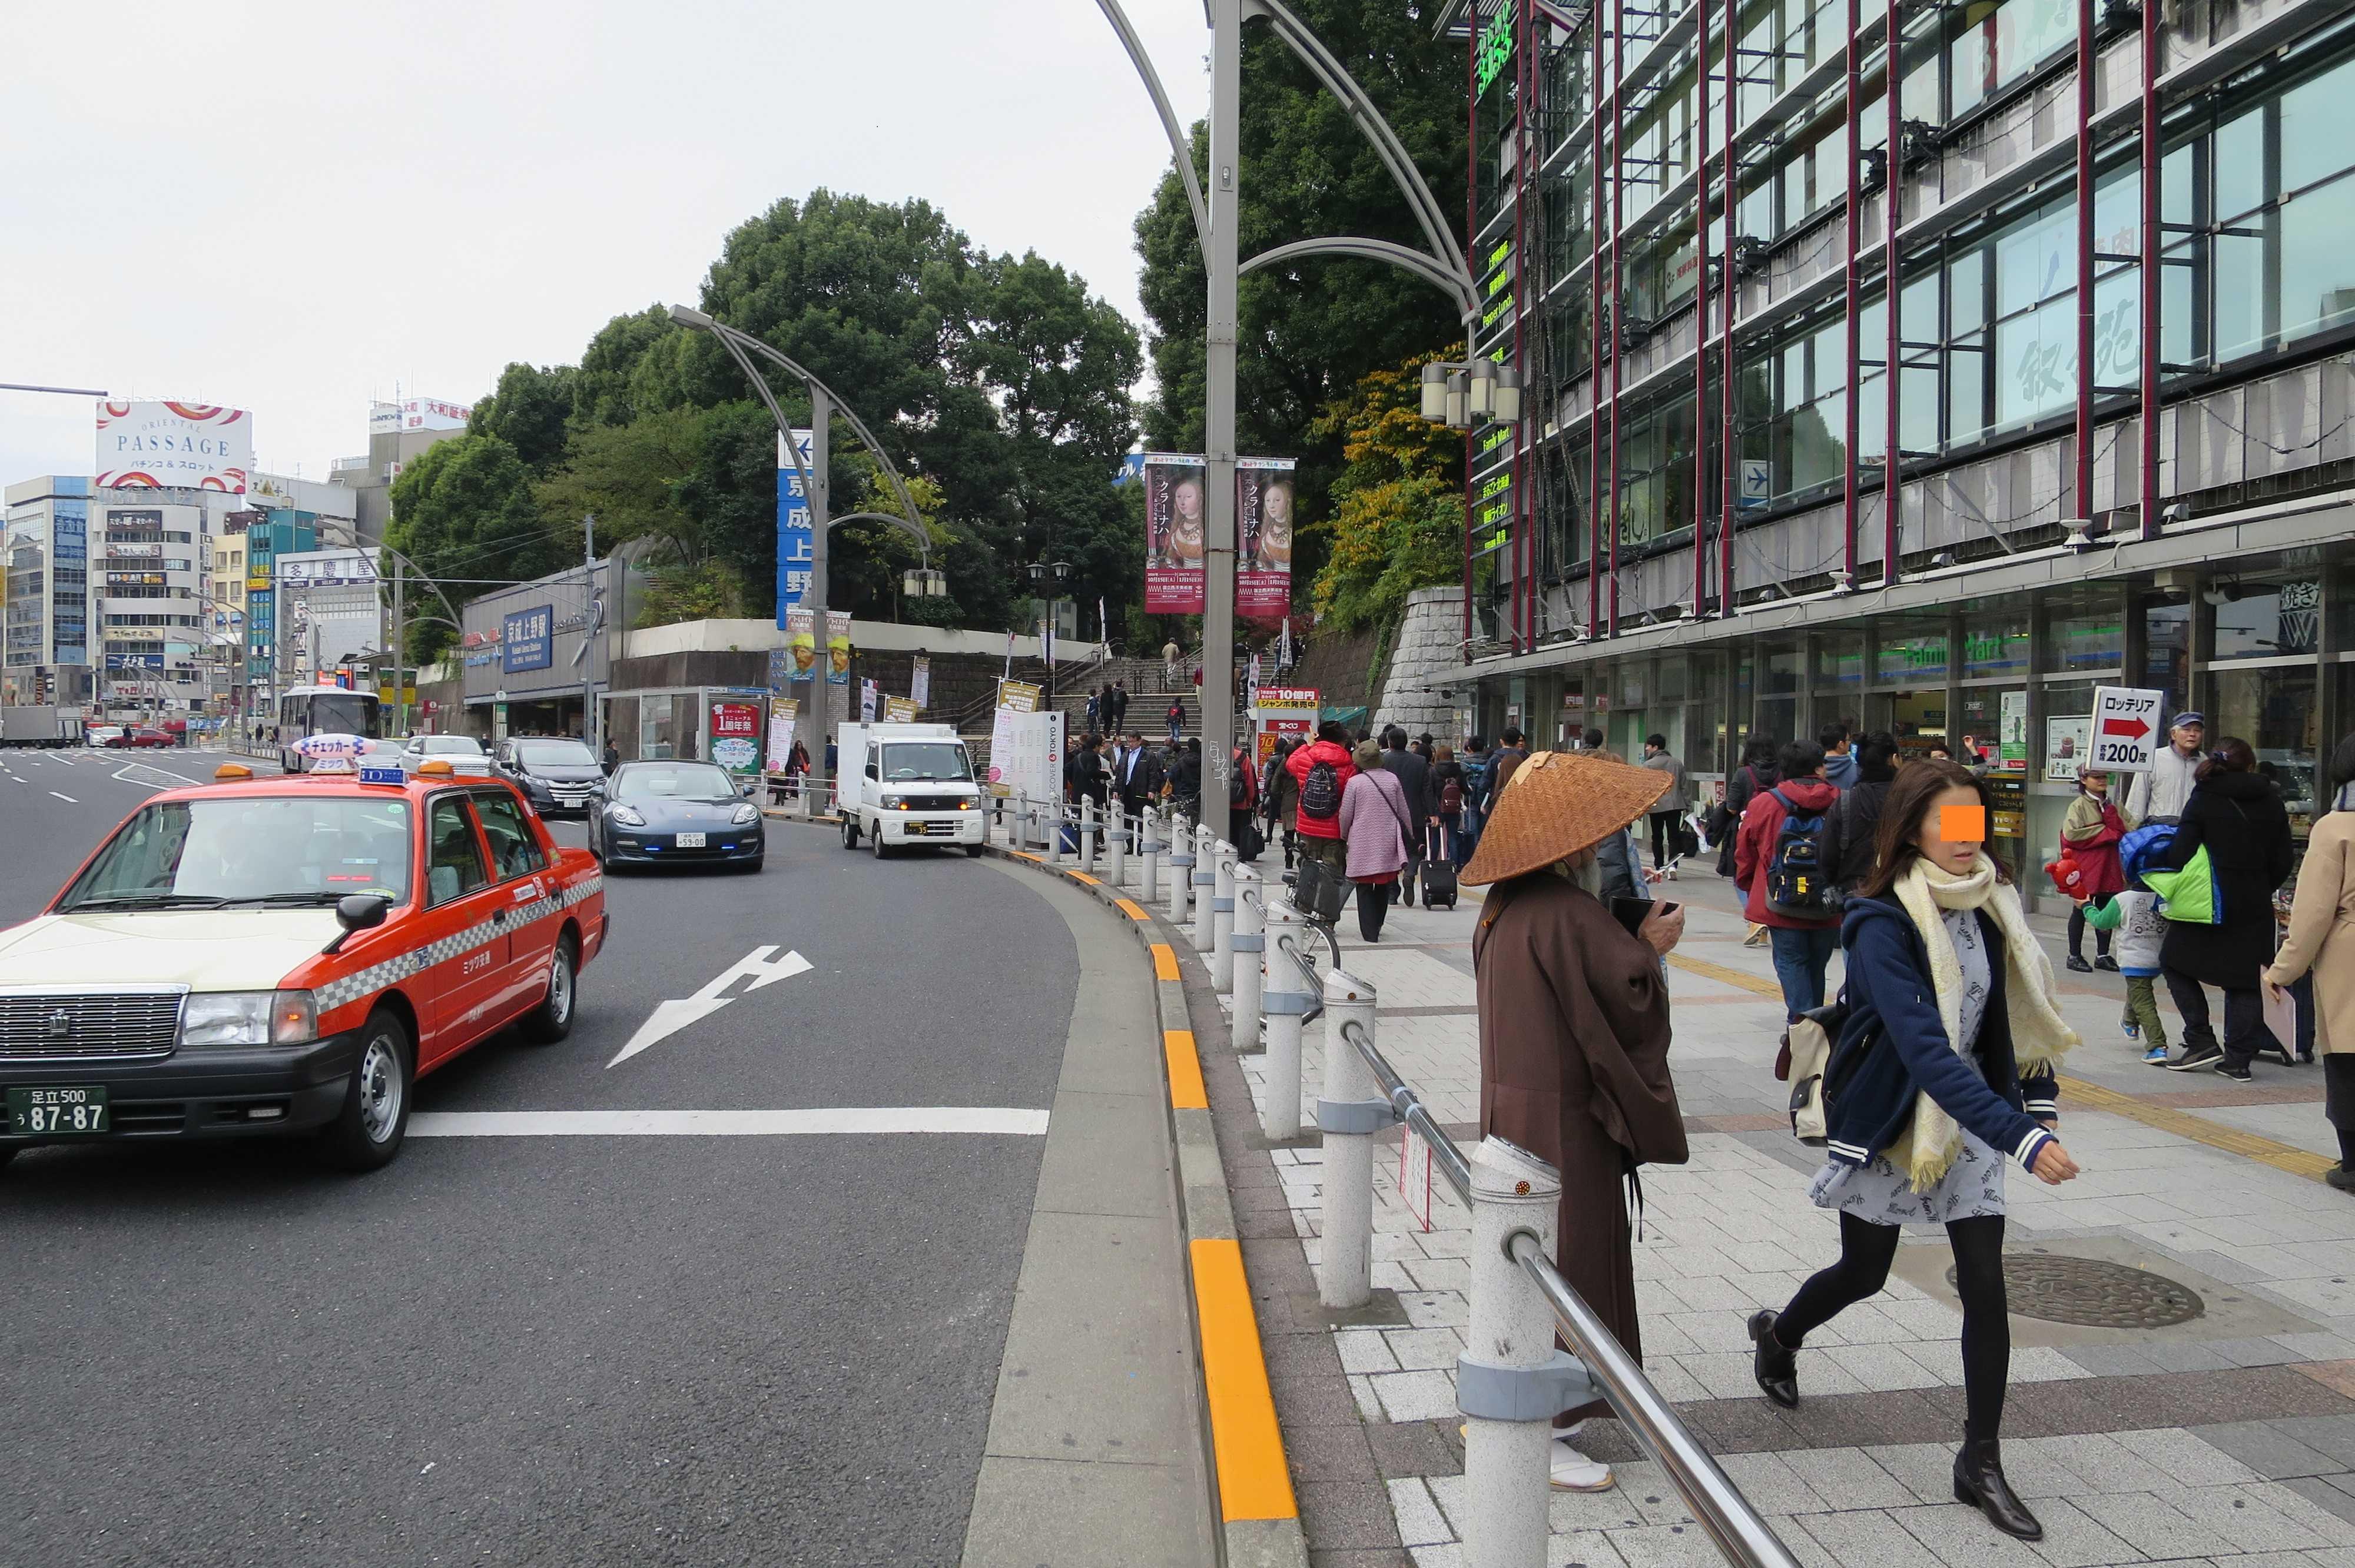 上野公園前の托鉢僧